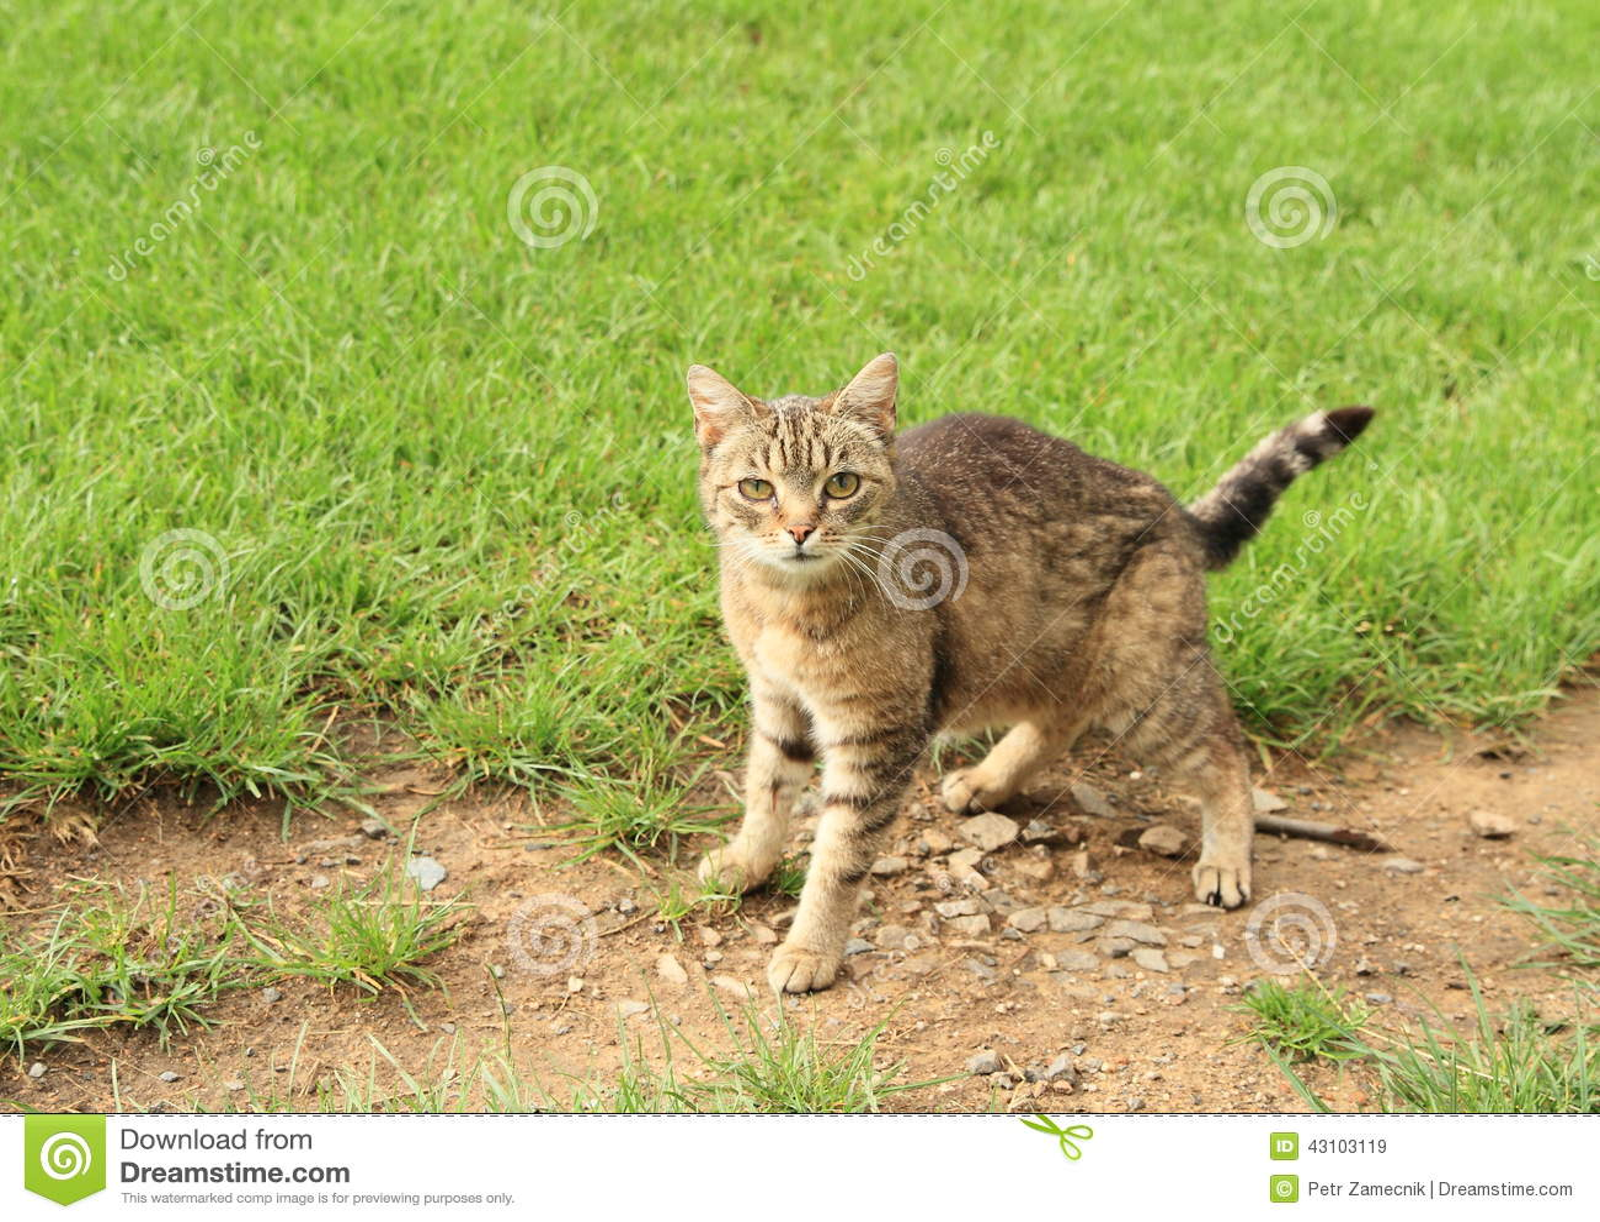 Scared tabby cat